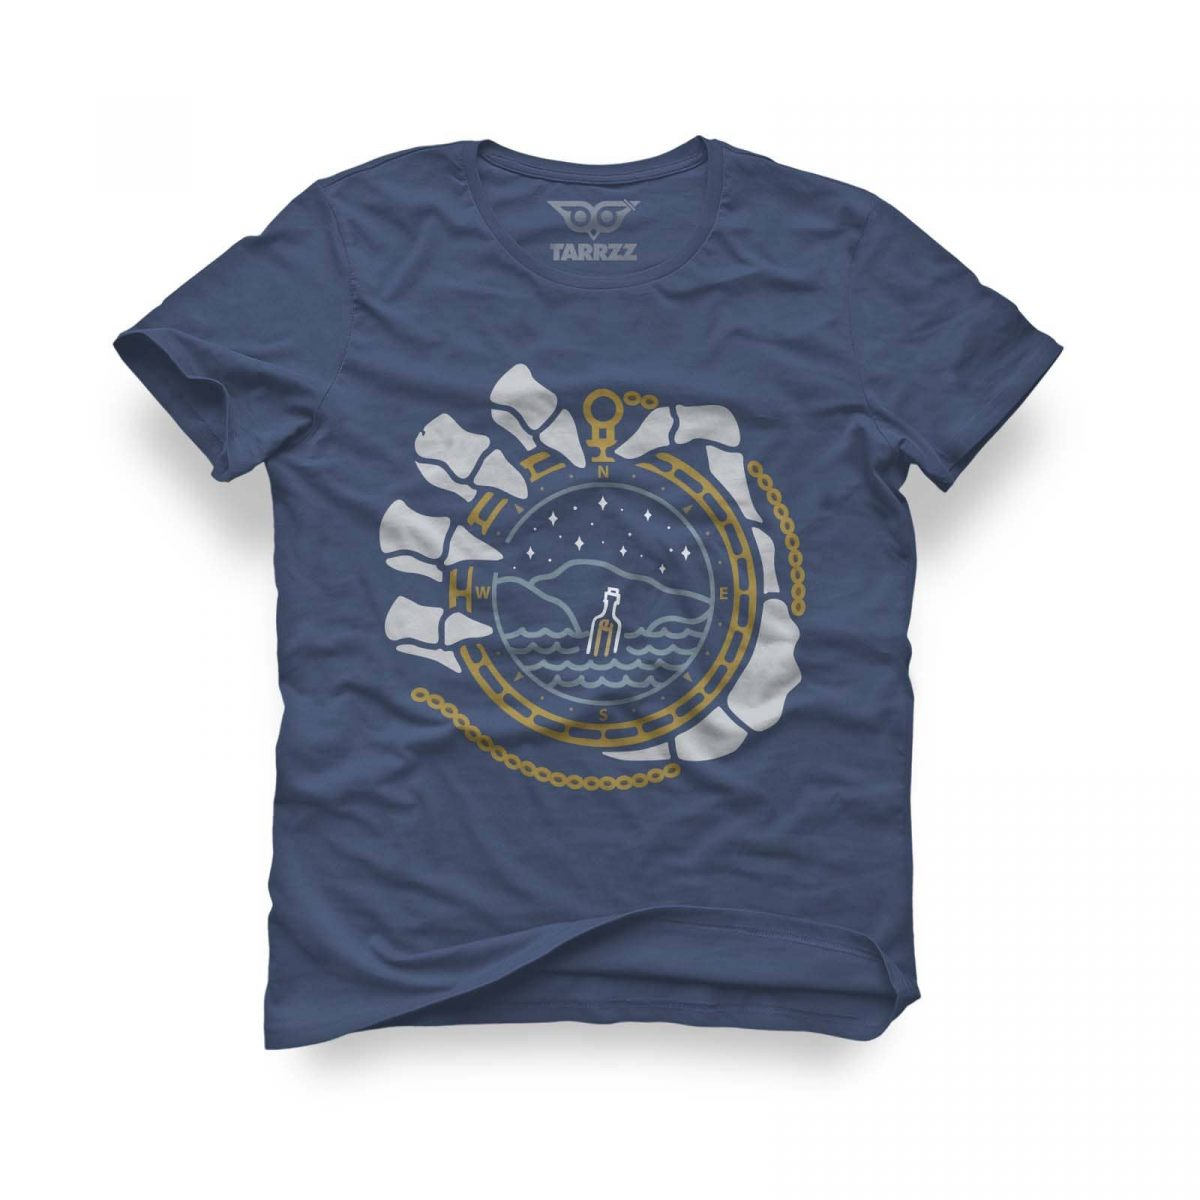 tarrzz-tasarim-indigo-mavi-tisort-pusula-ve-iskelet